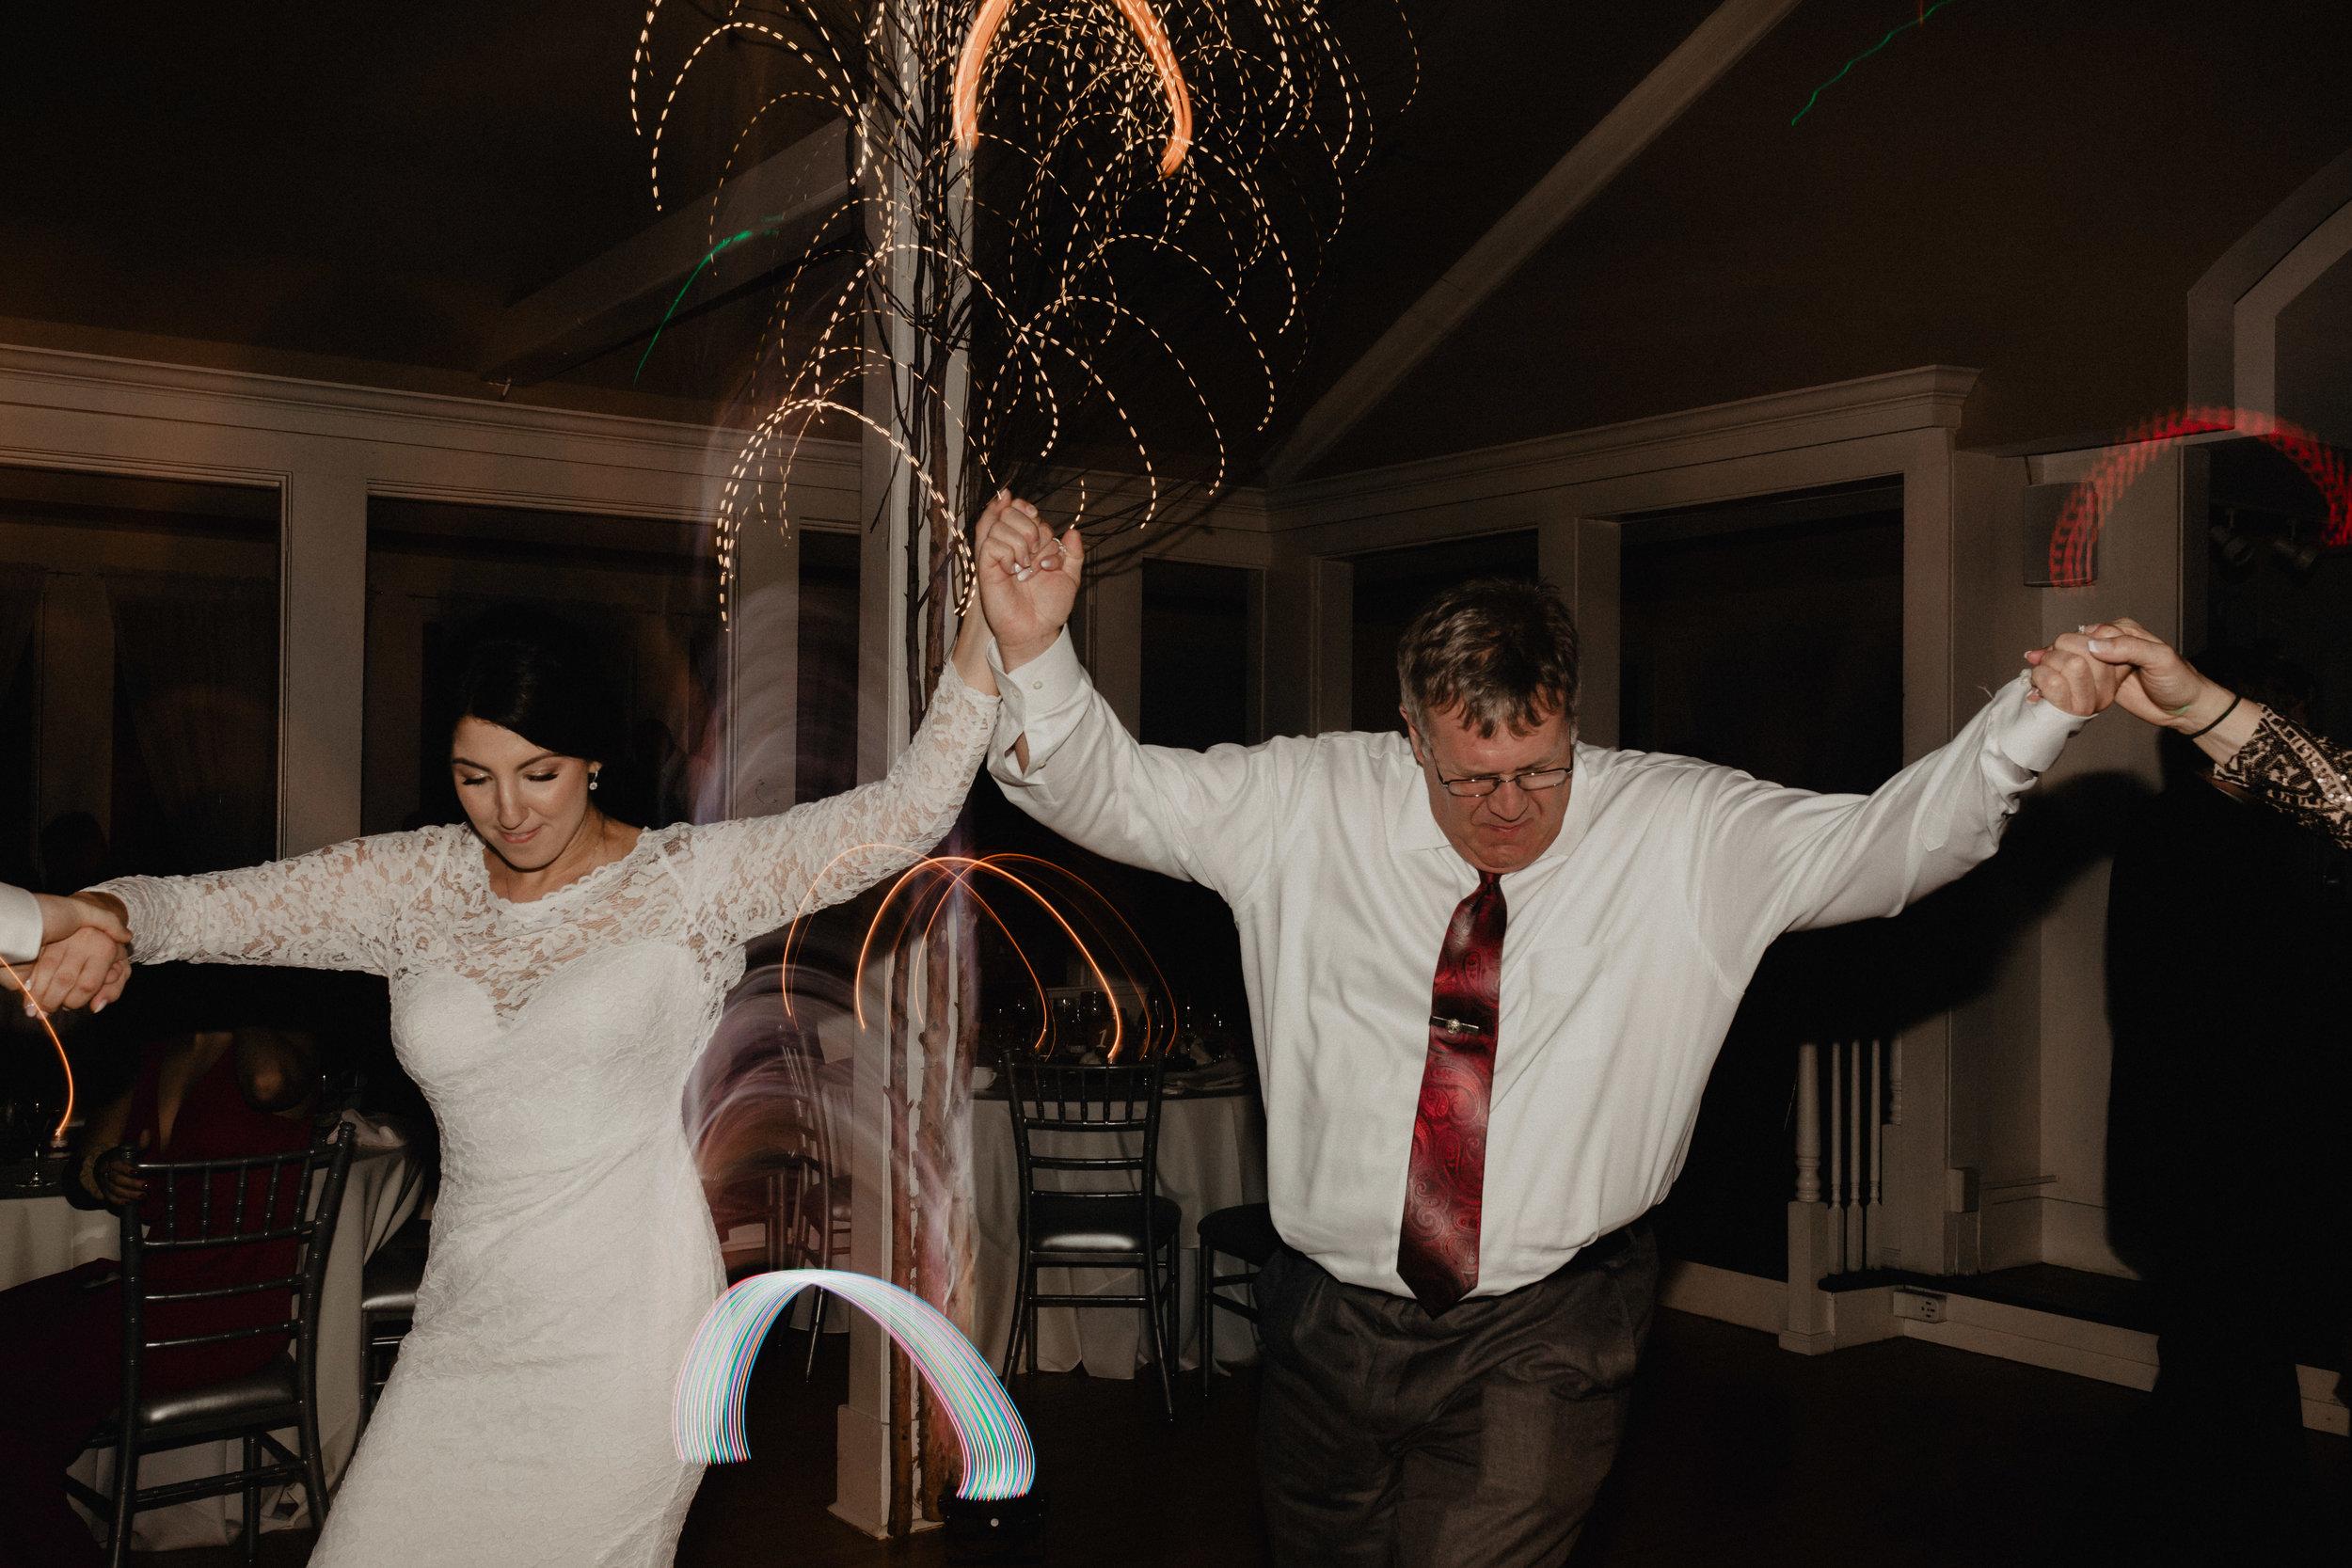 old_daley_on_crooked_lake_wedding_097.jpg